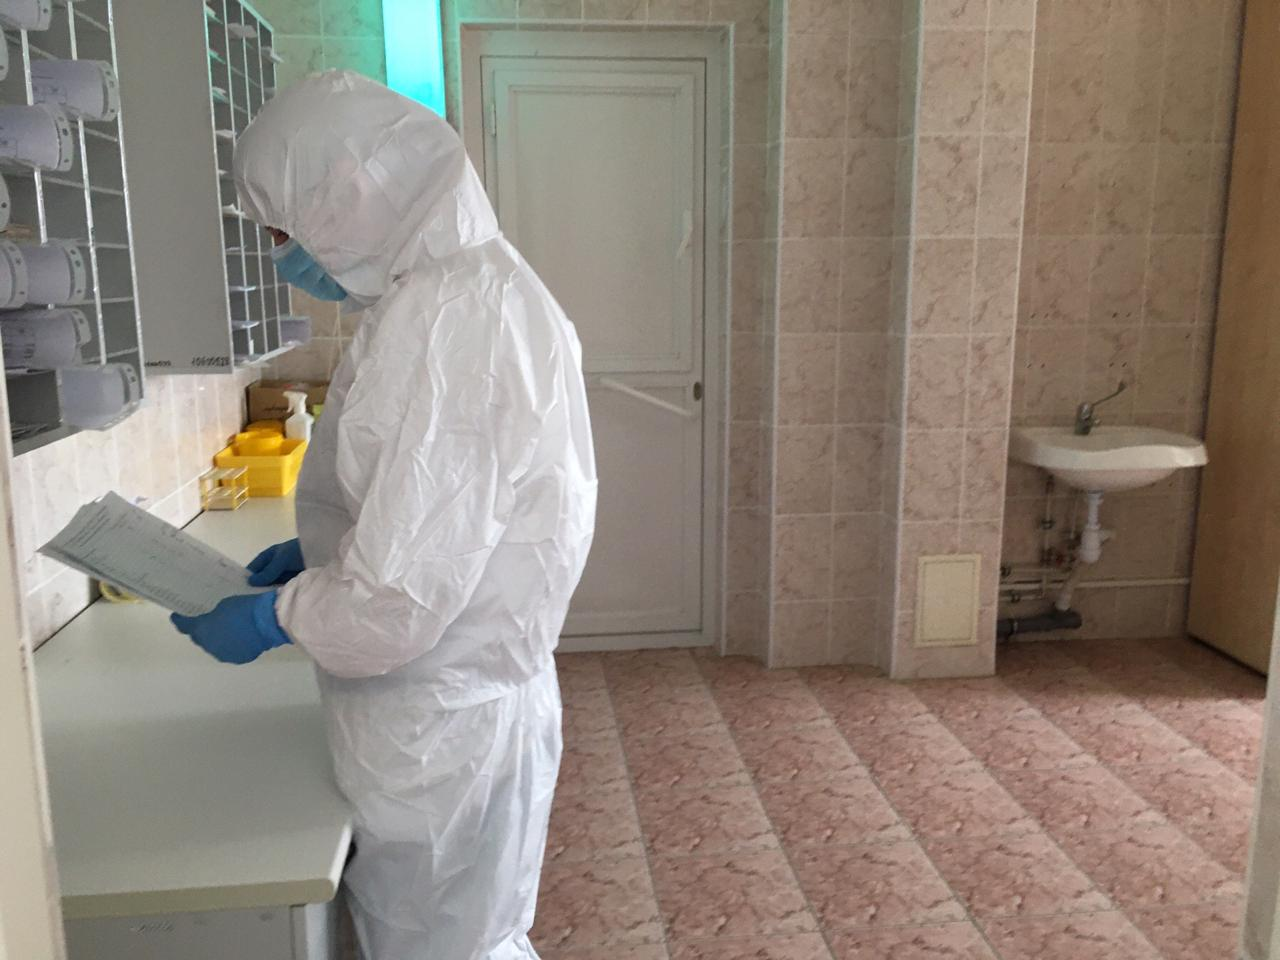 С декабря ни один медработник не скончался от COVID в Прикамье